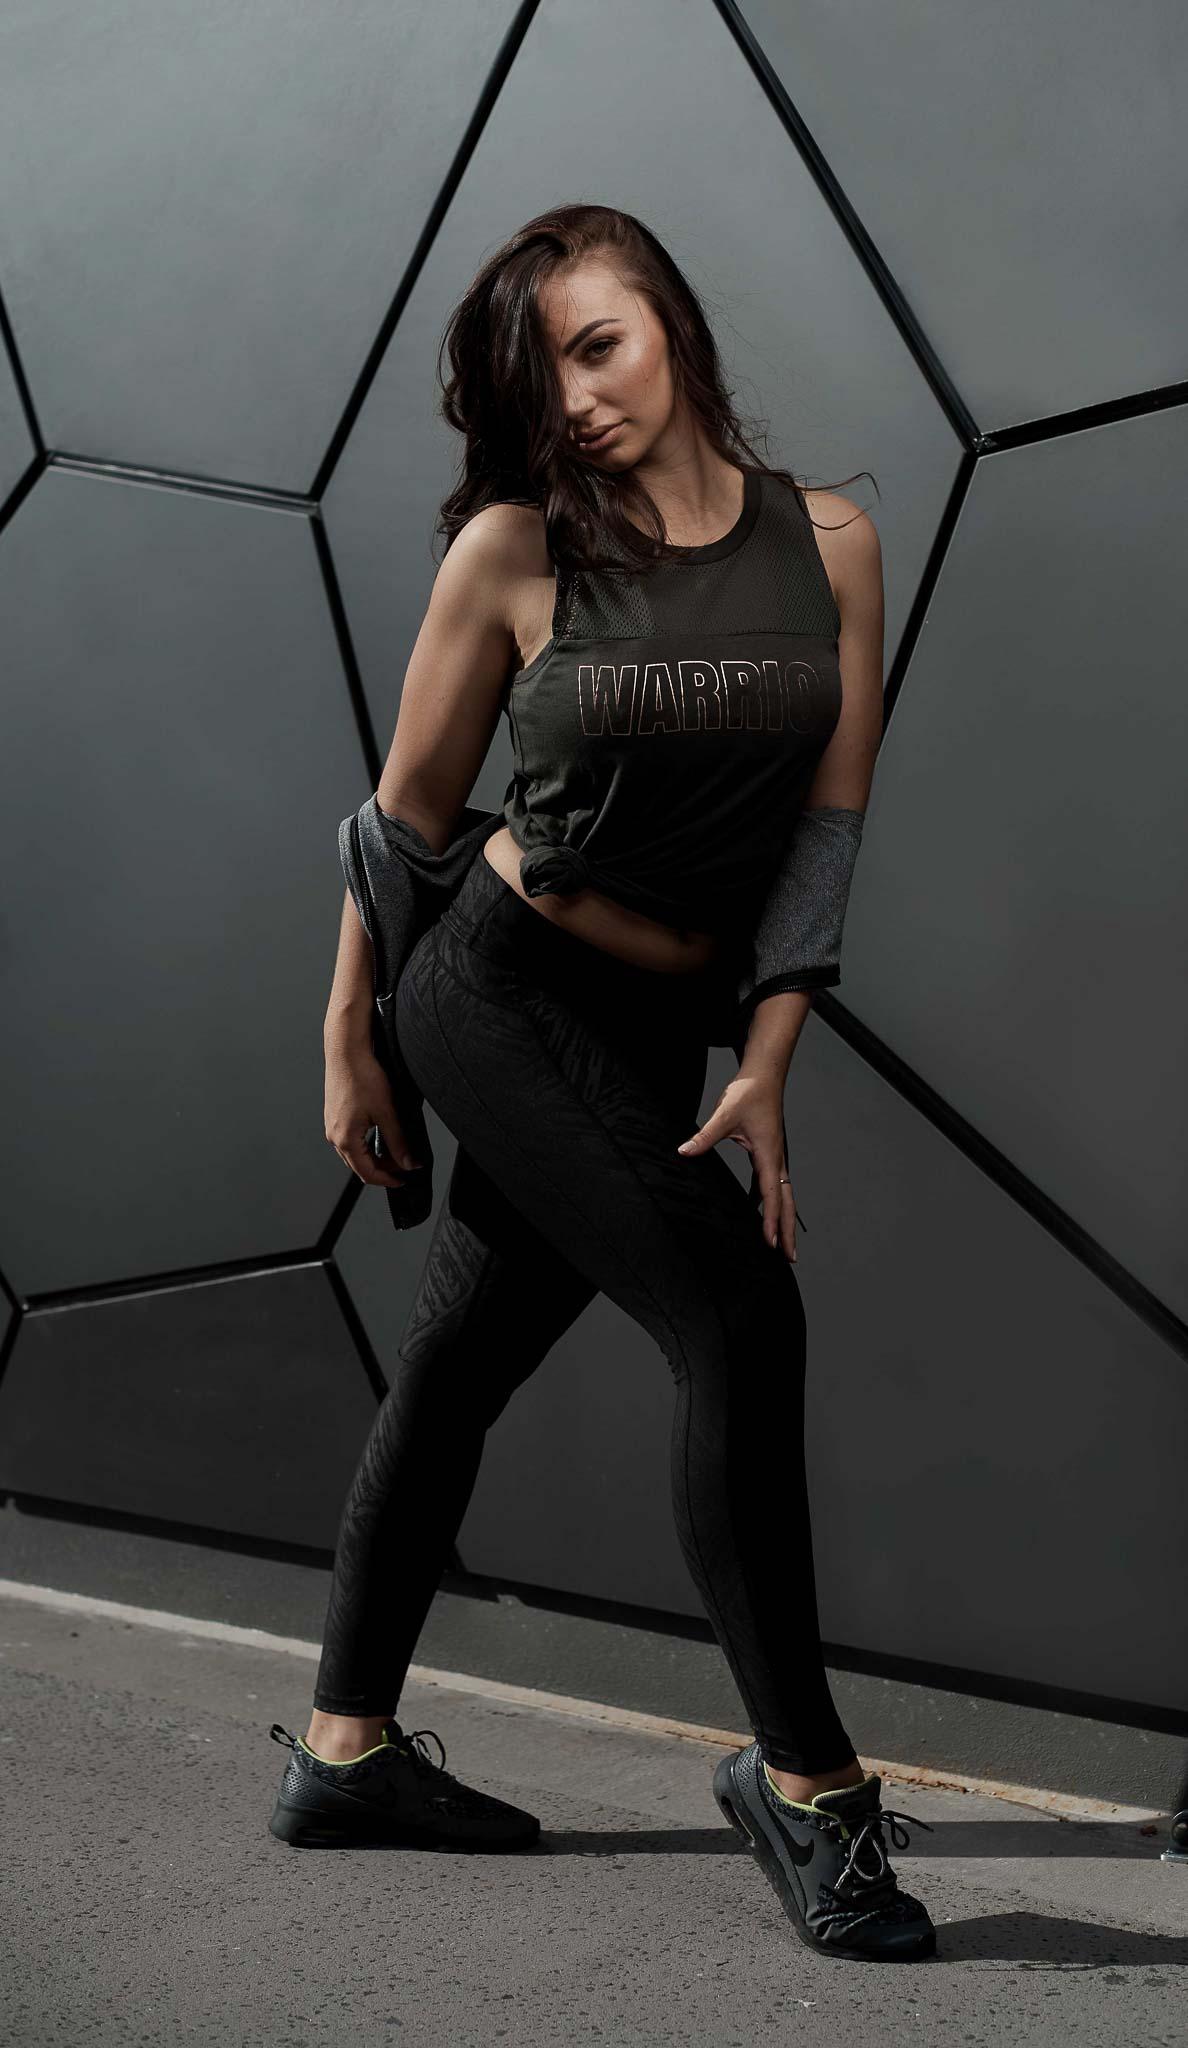 Brihannan Gold Coast fitness model